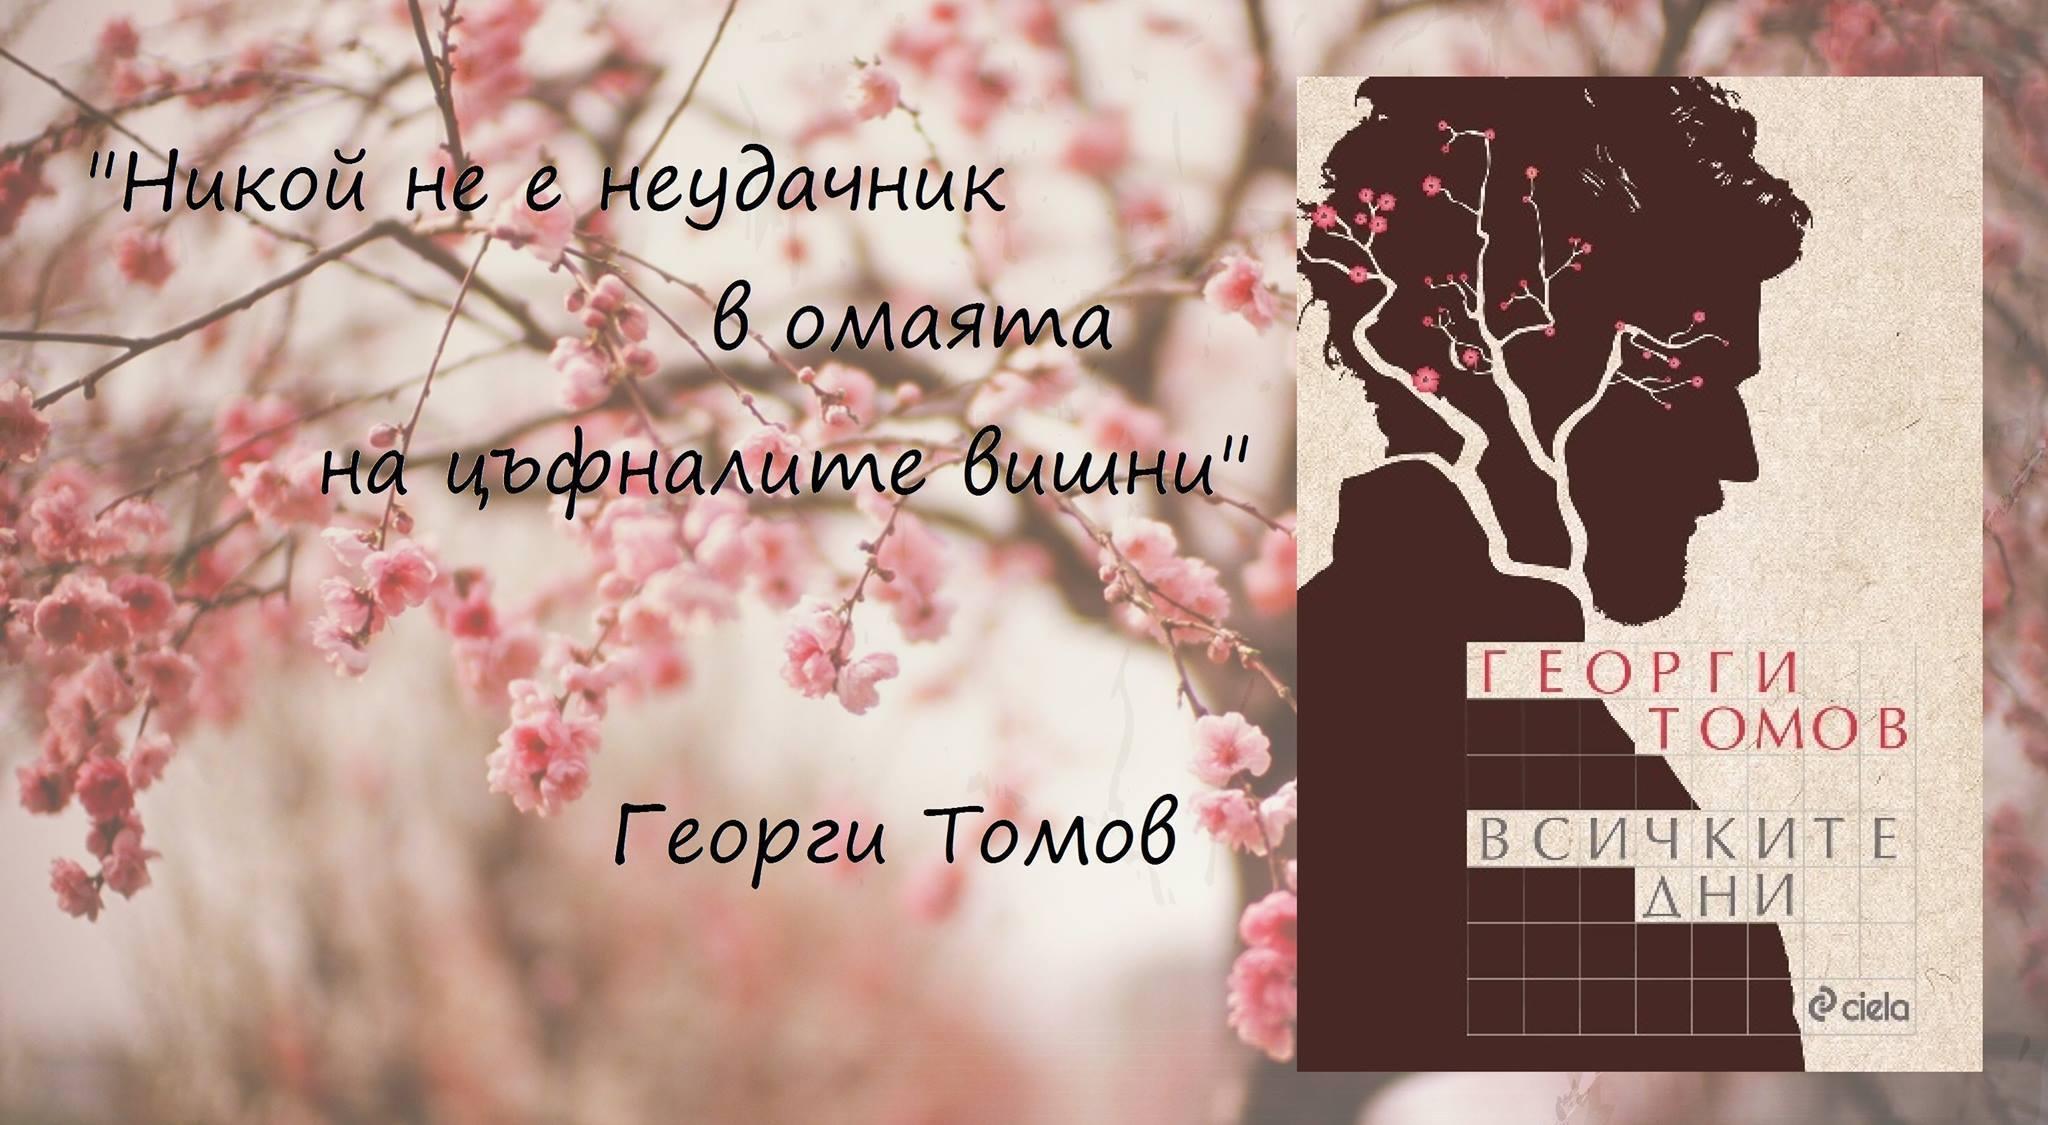 Tomov3